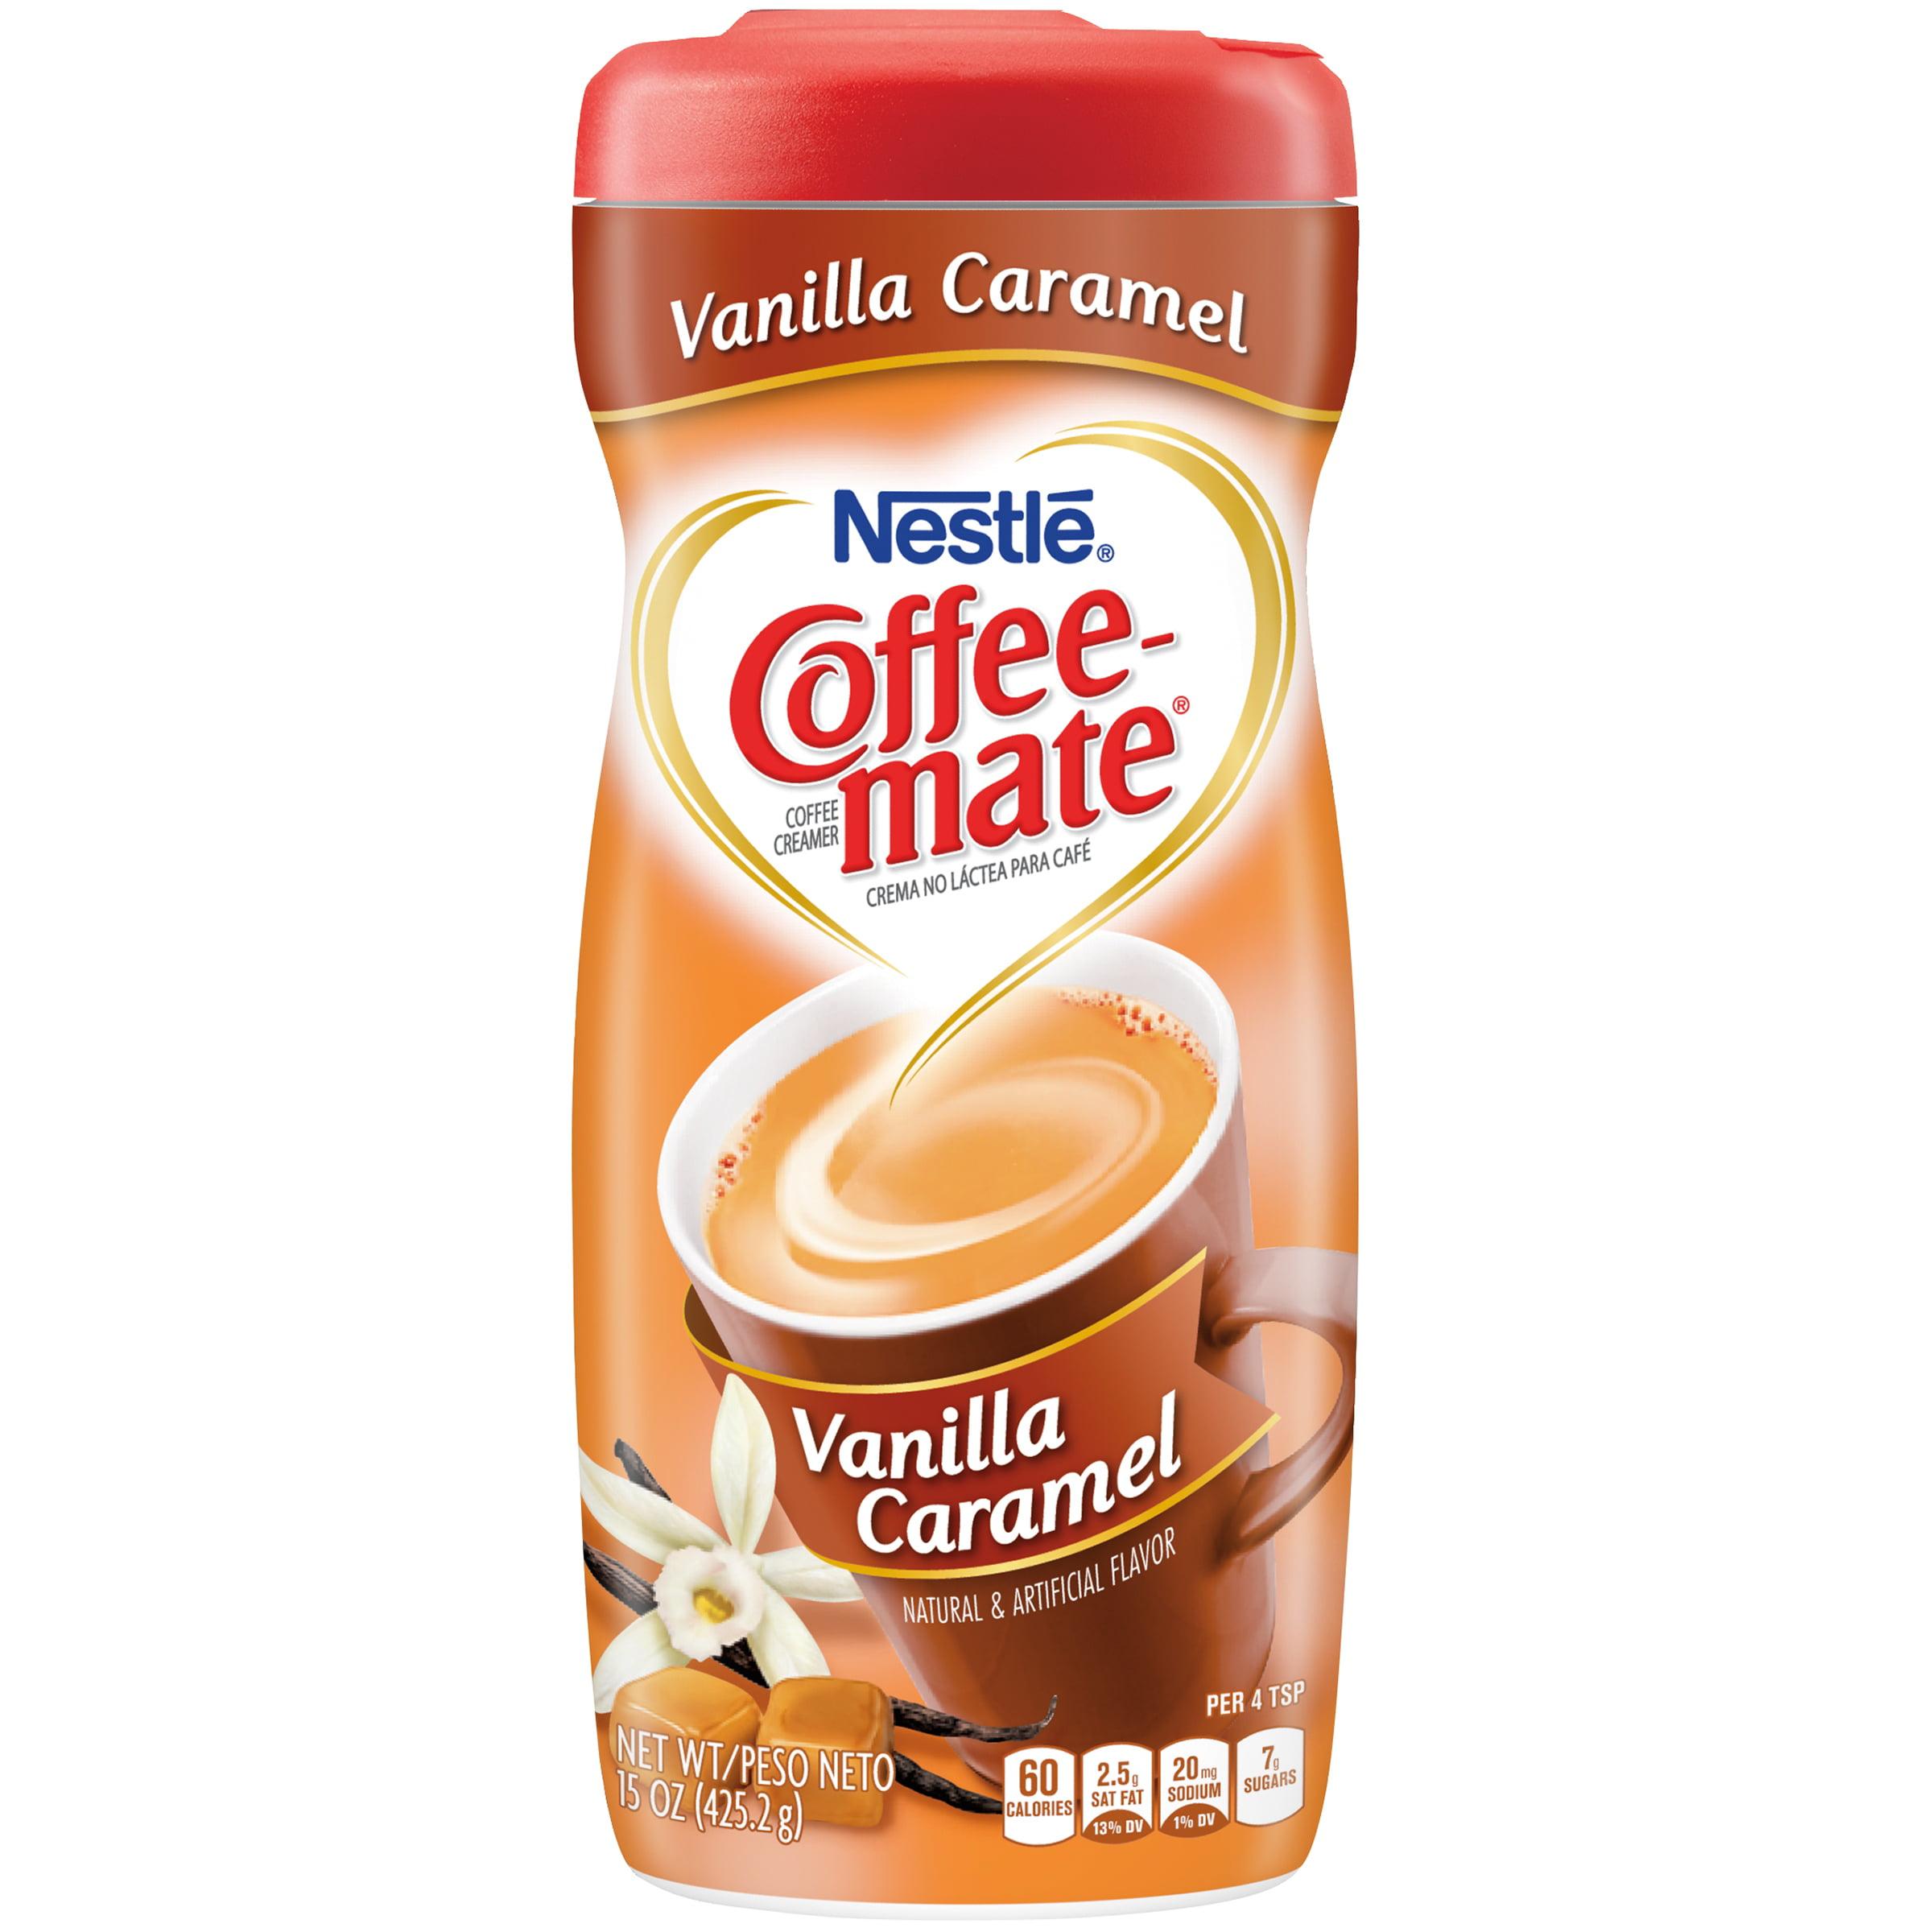 (3 pack) COFFEE MATE Vanilla Caramel Powder Coffee Creamer 15 oz. Canister